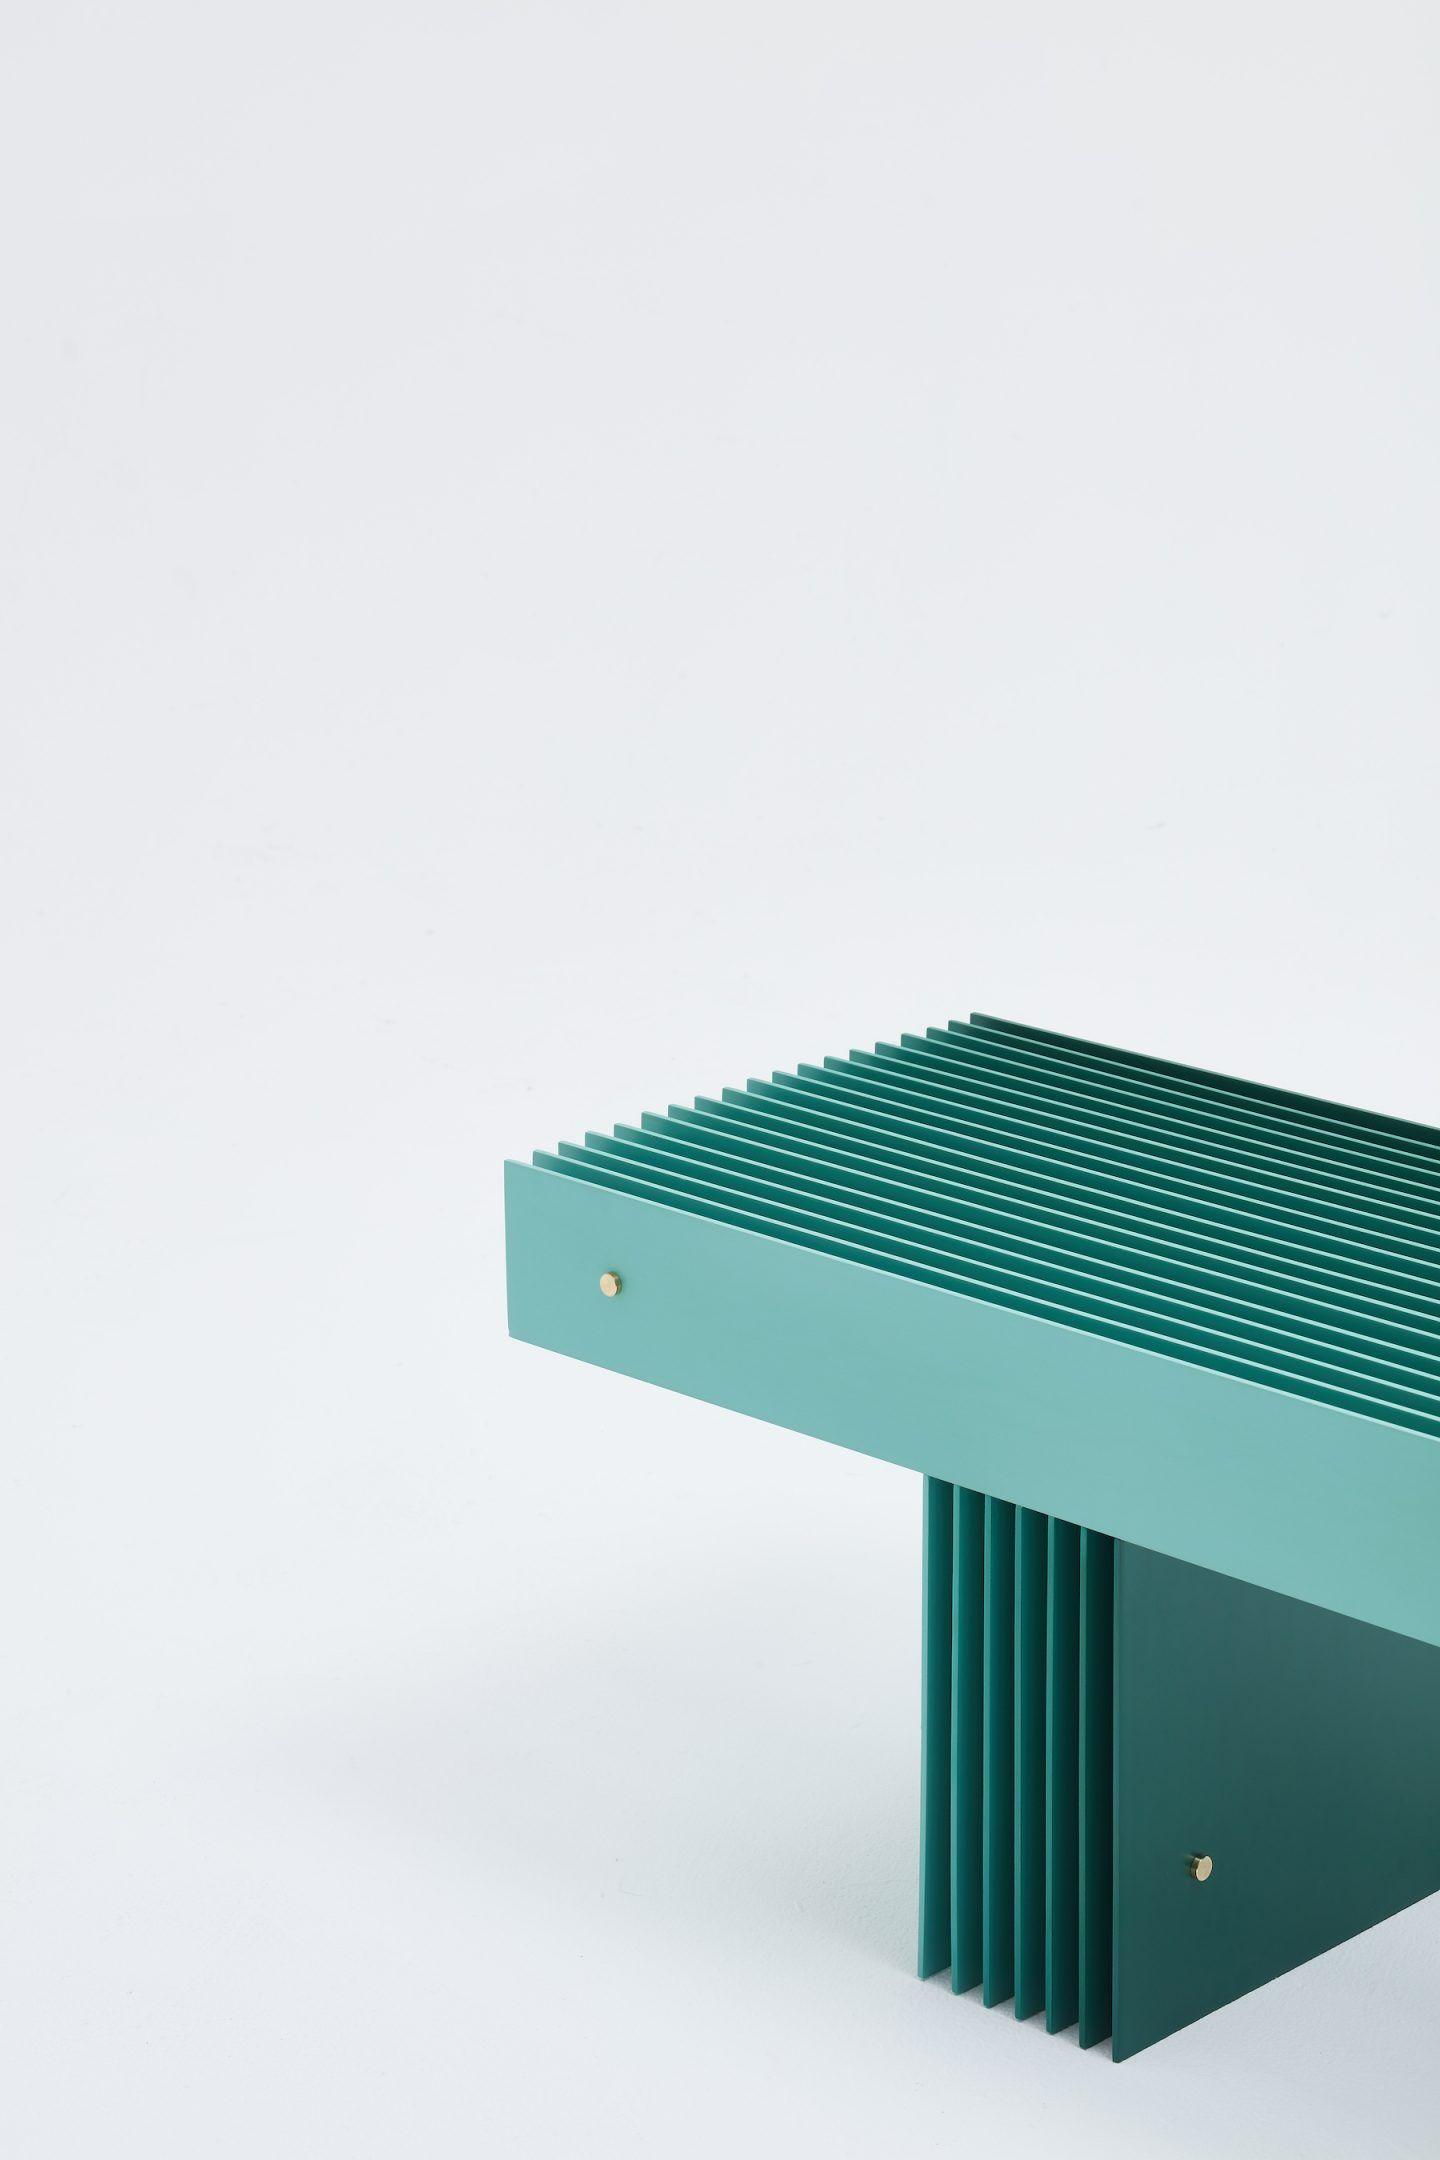 IGNANT-Design-Mario-Tsai-Grid-Bench-07